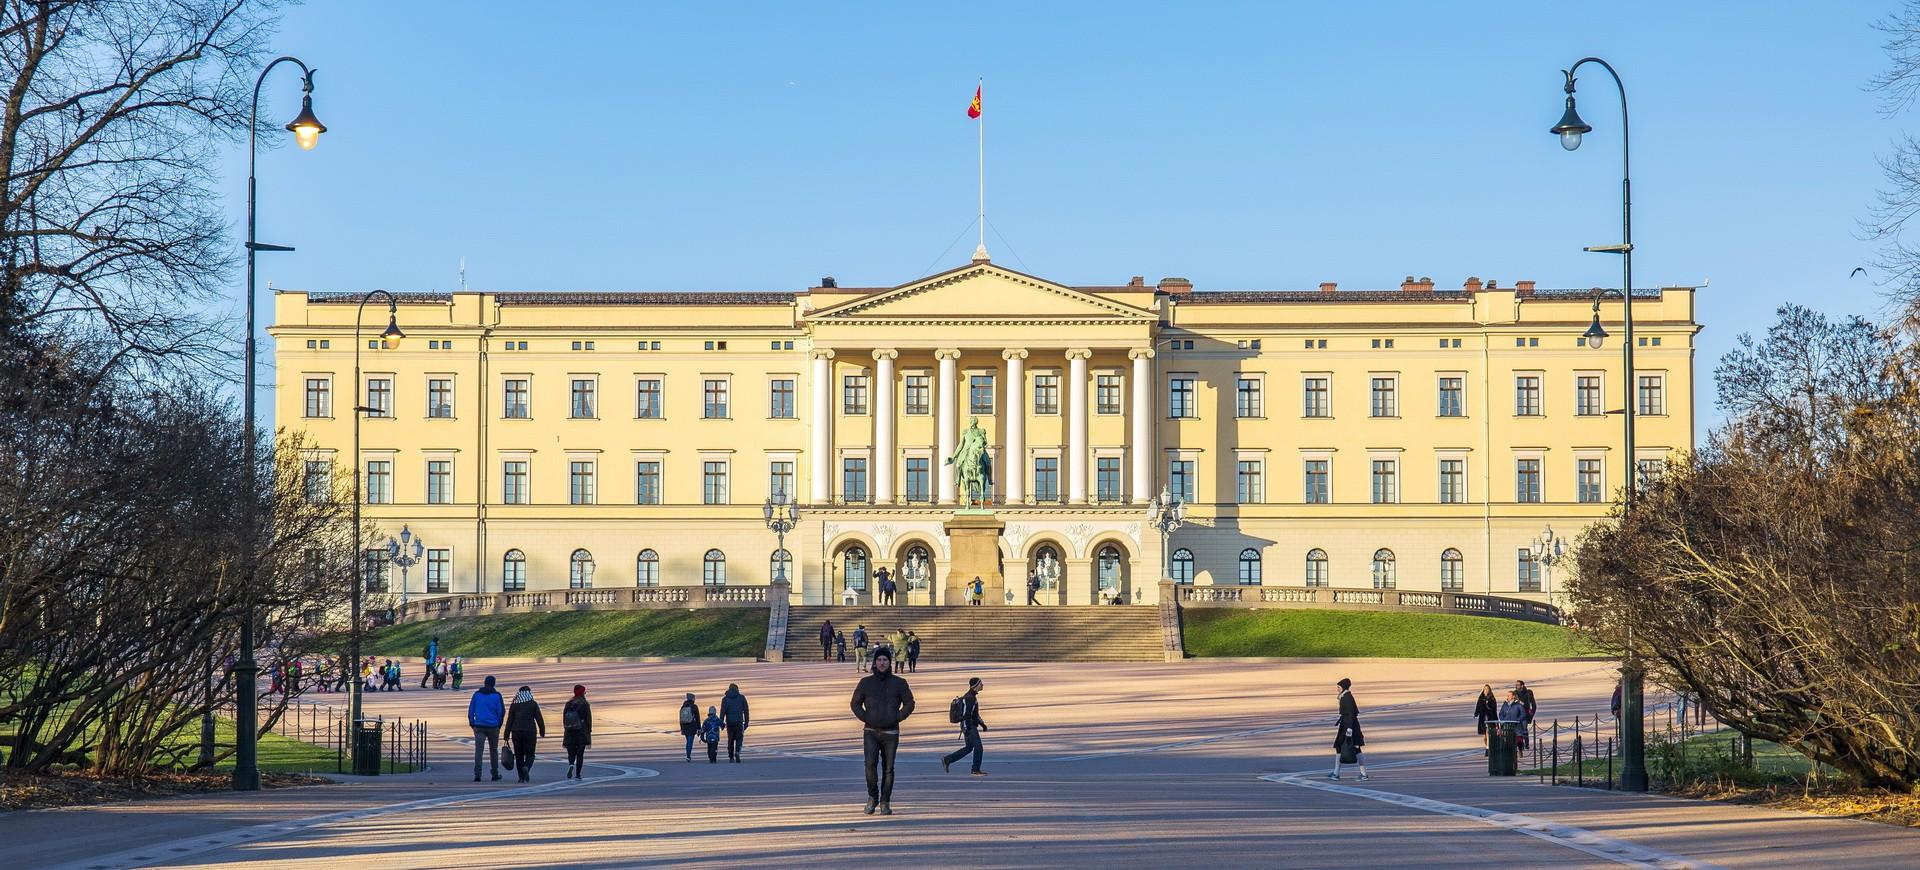 Palais Royal Kongelige Slott à Oslo en Norvège